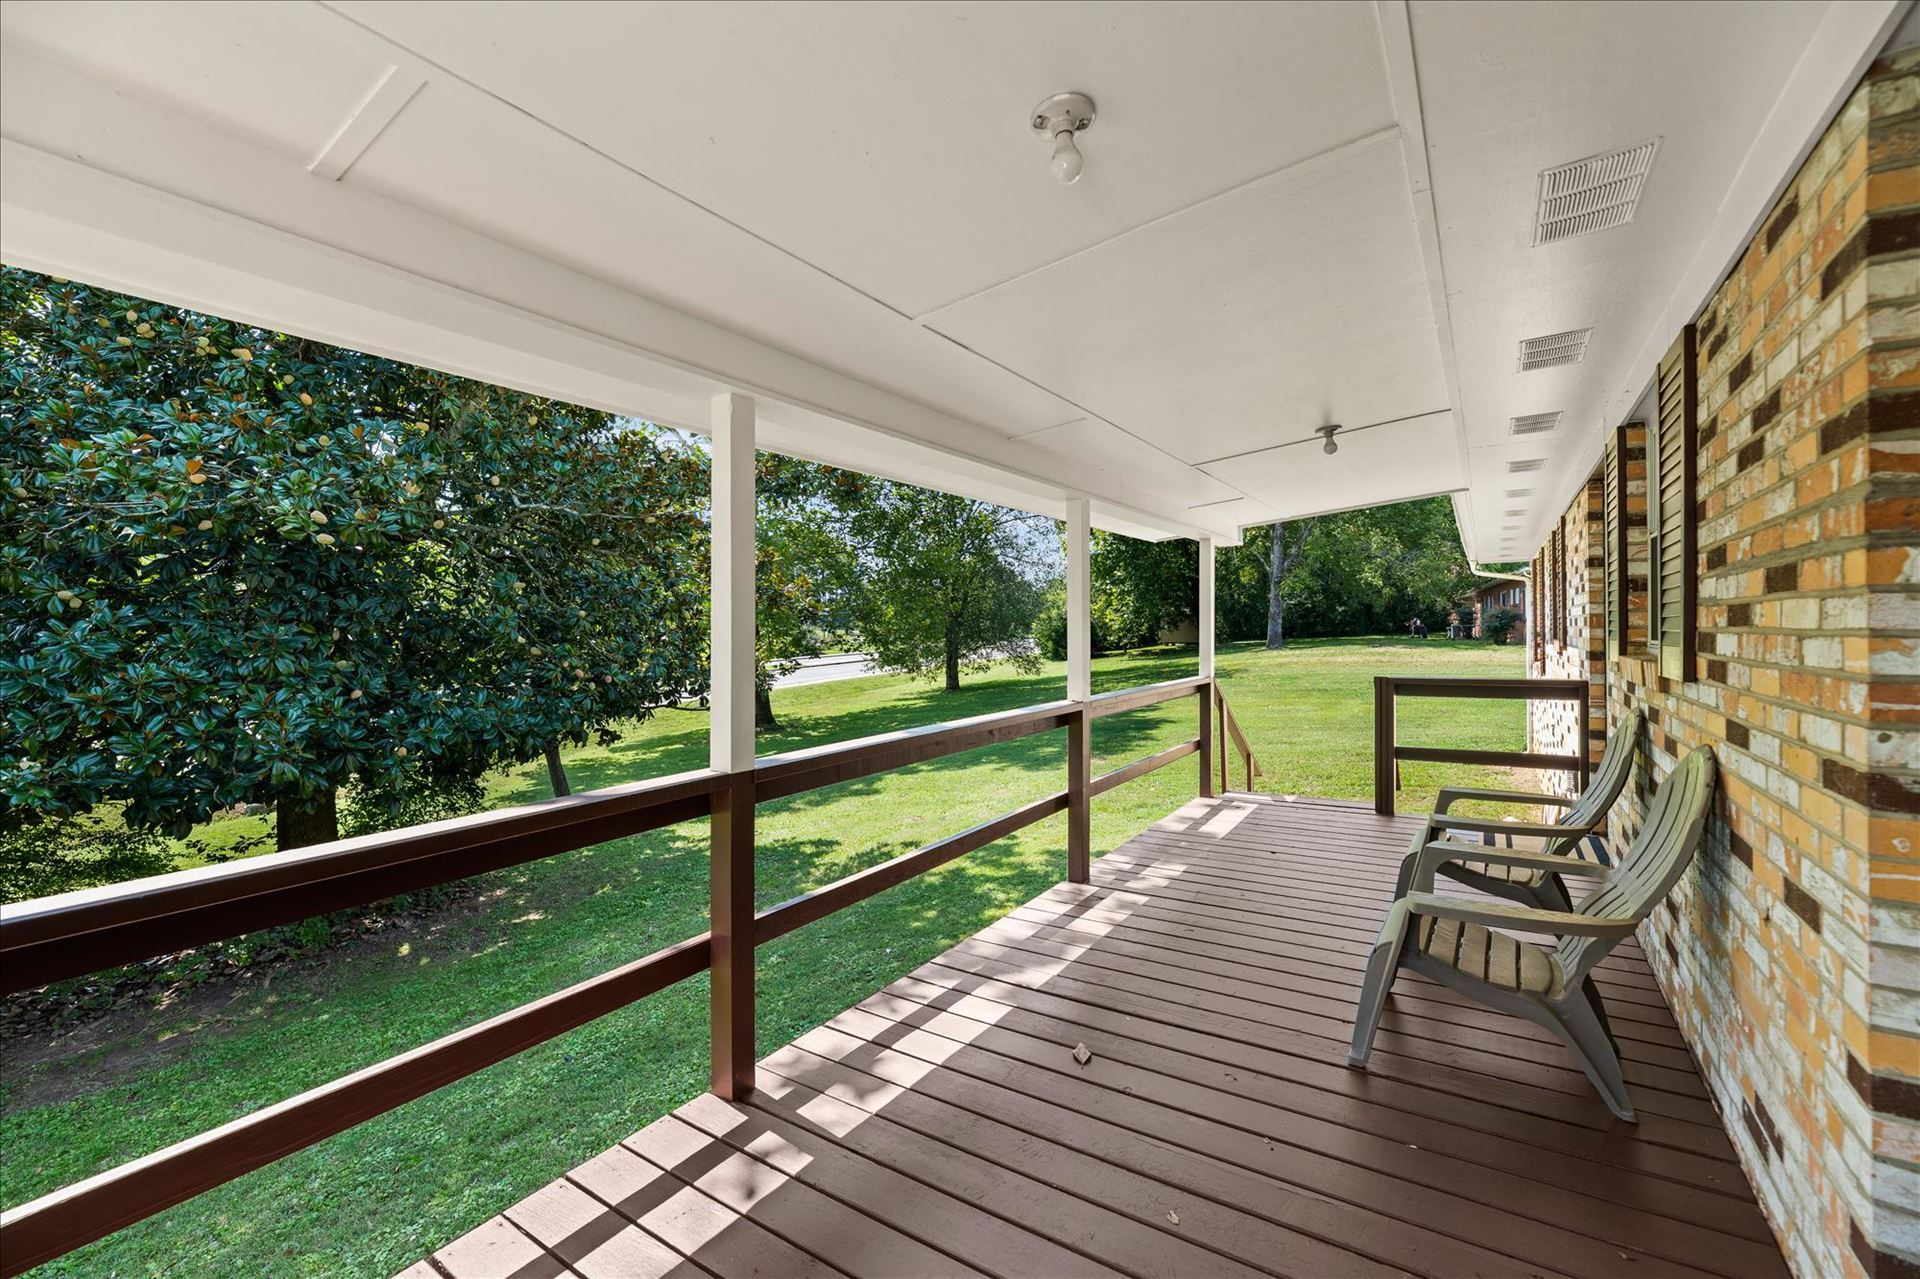 Photo of 101 Maywood Rd, Oak Ridge, TN 37830 (MLS # 1167516)